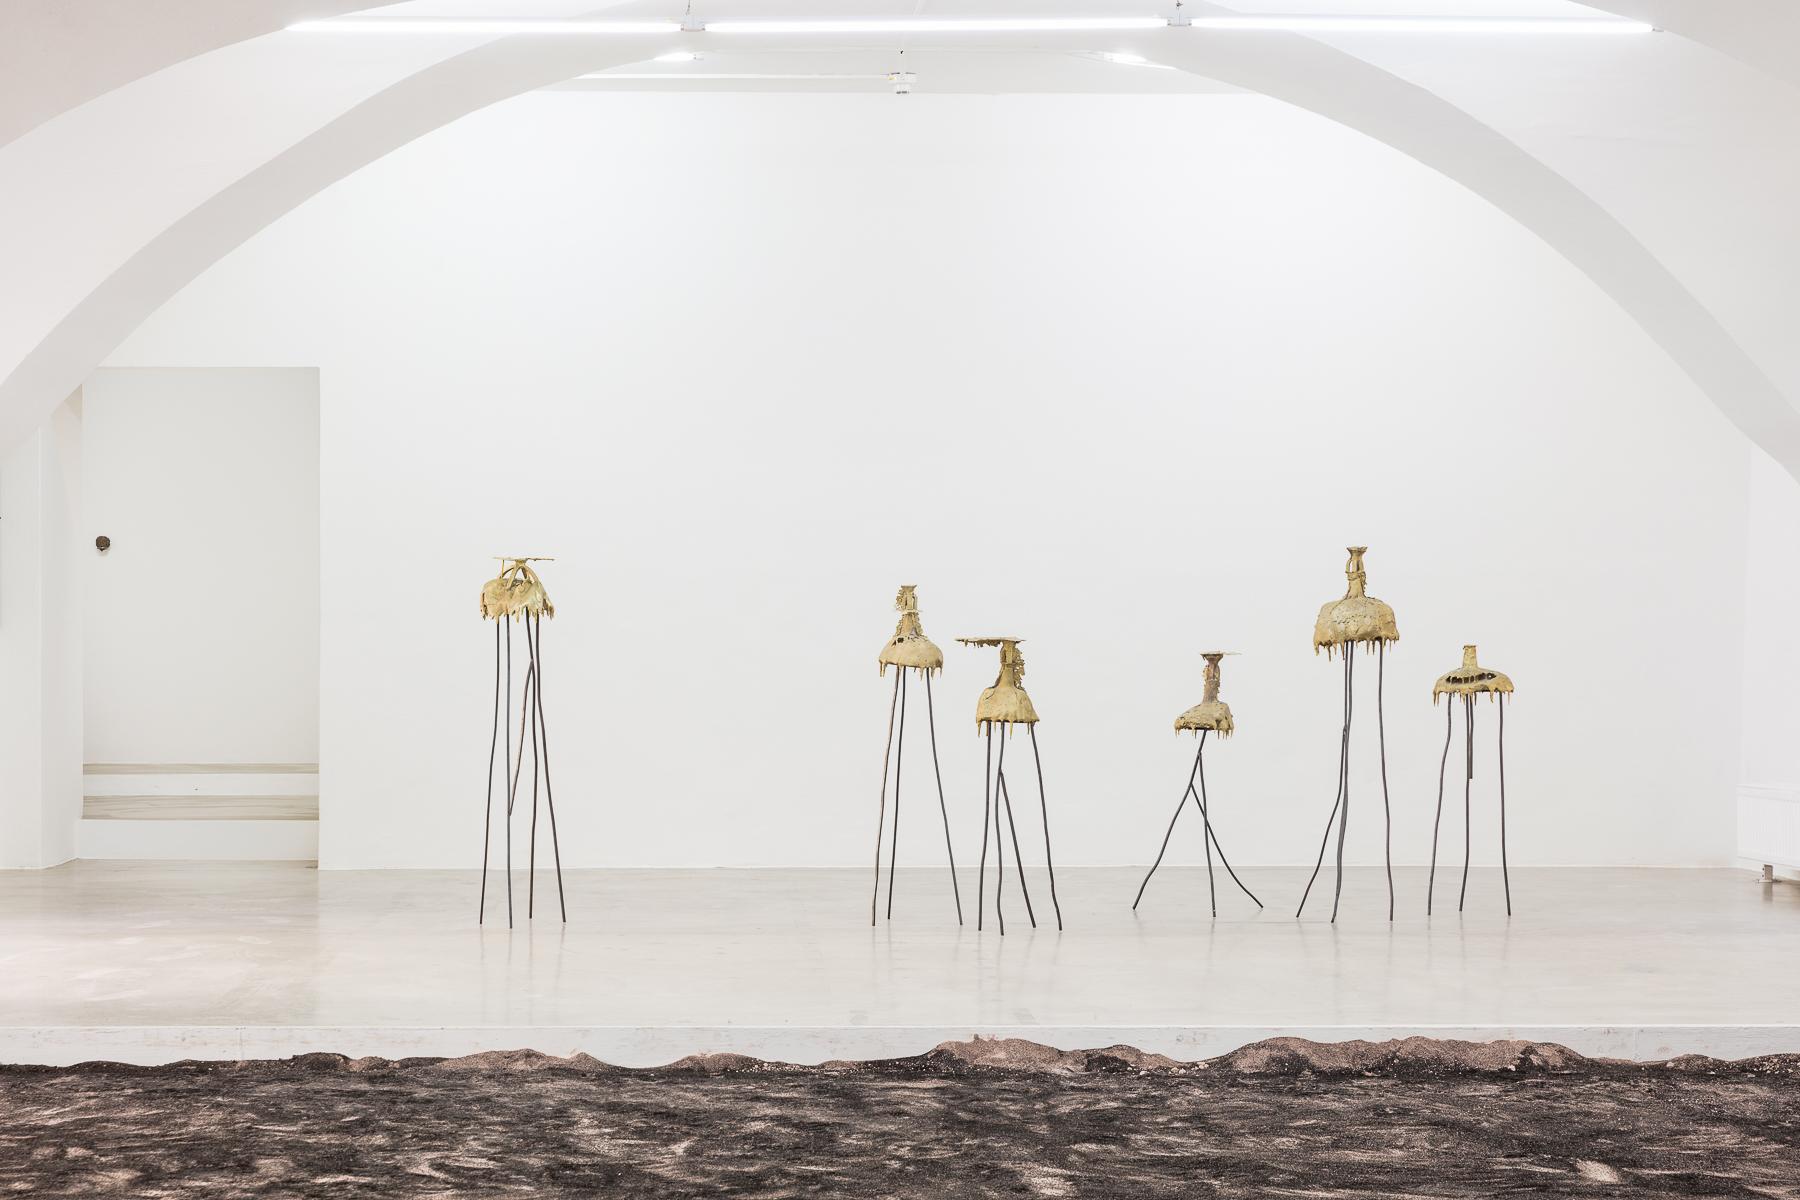 2019_02_19_Angelika Loderer_Kunstverein Graz_by_kunstdokumentationcom_005_web.jpg